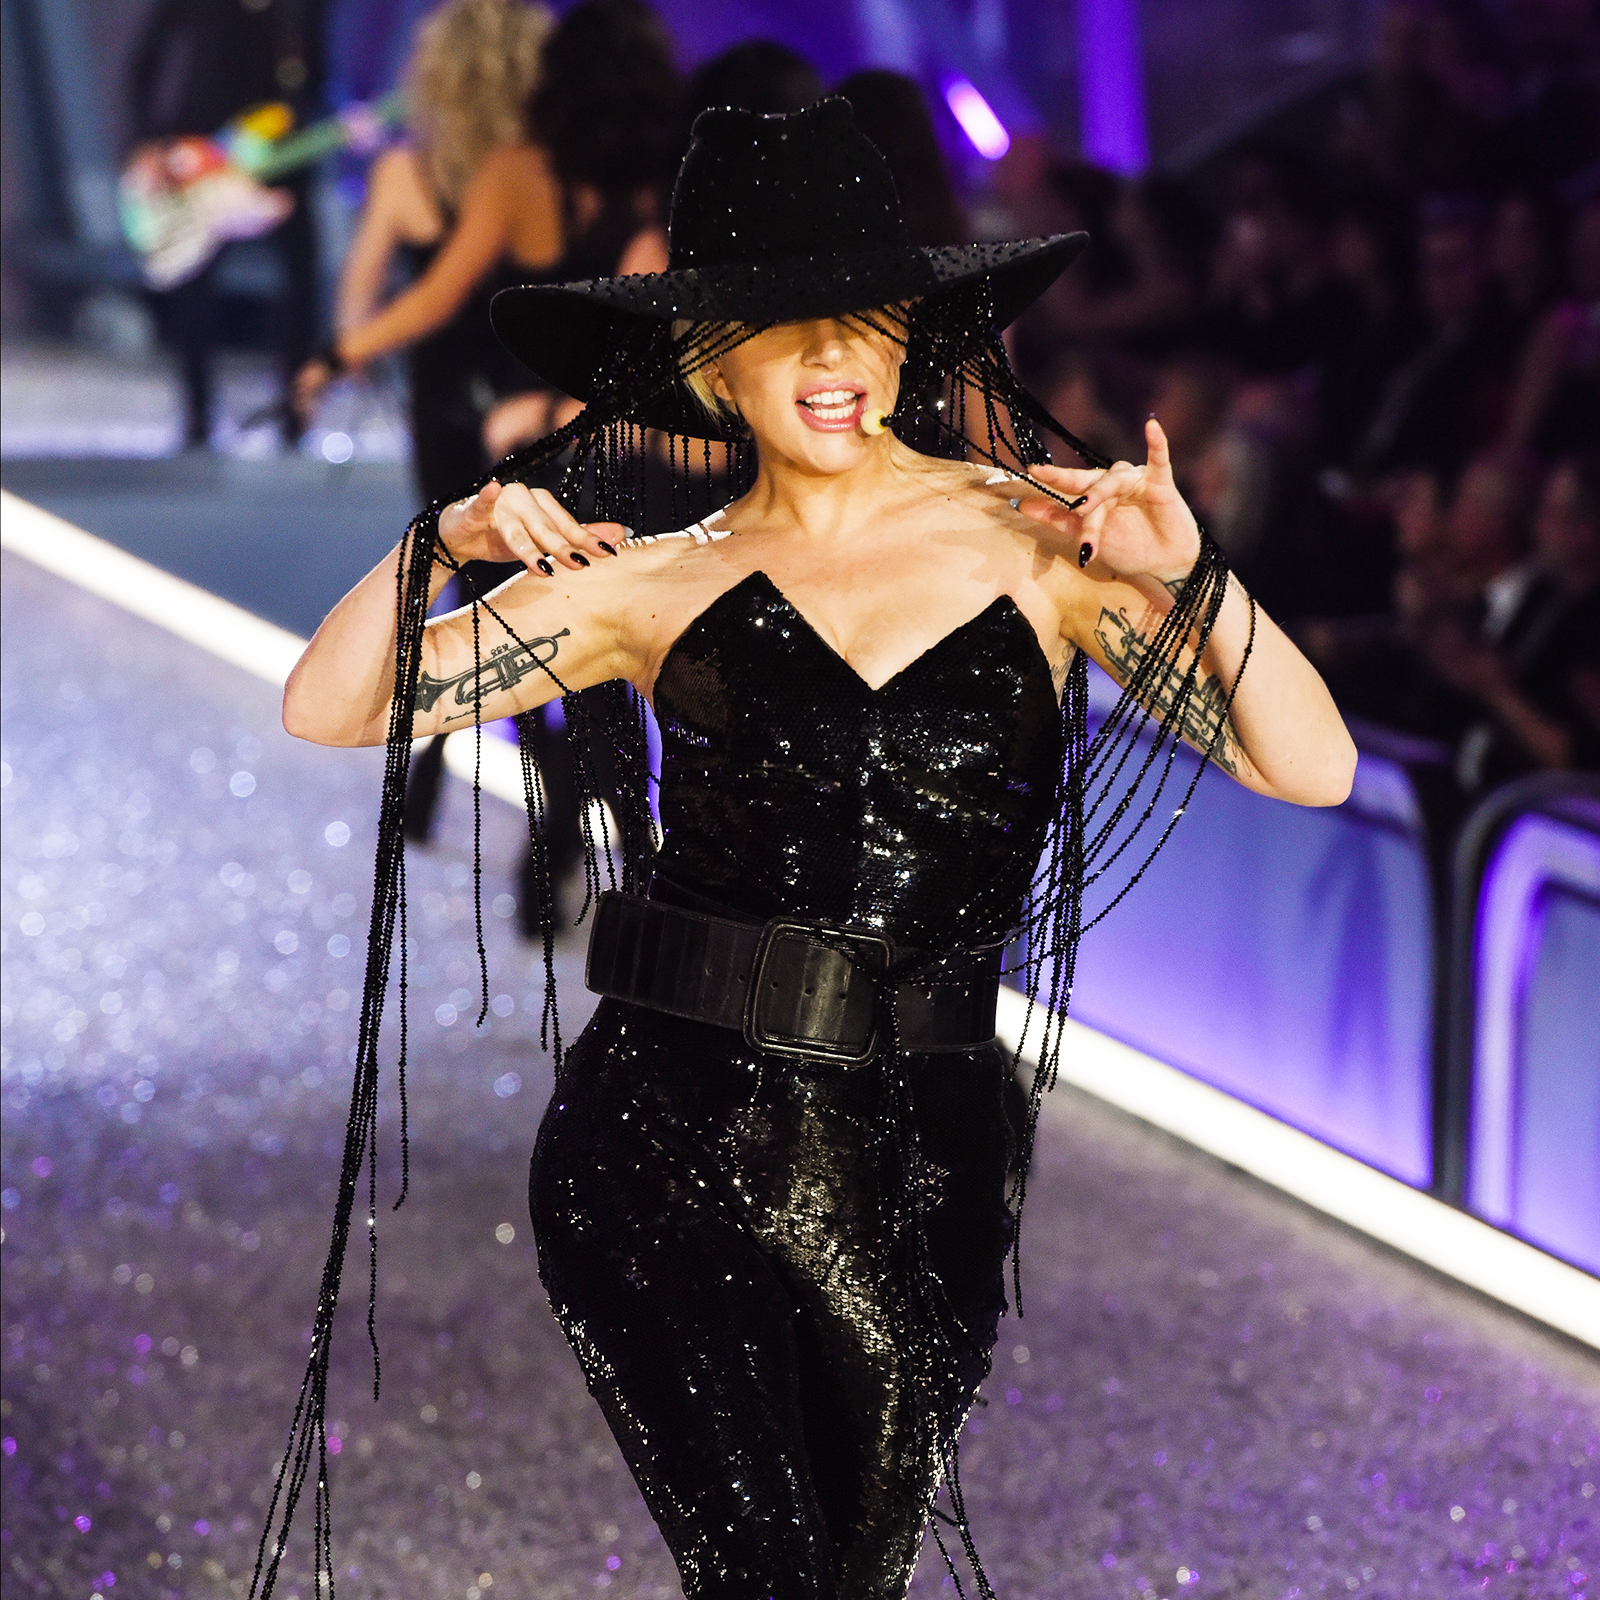 Lady Gaga hats